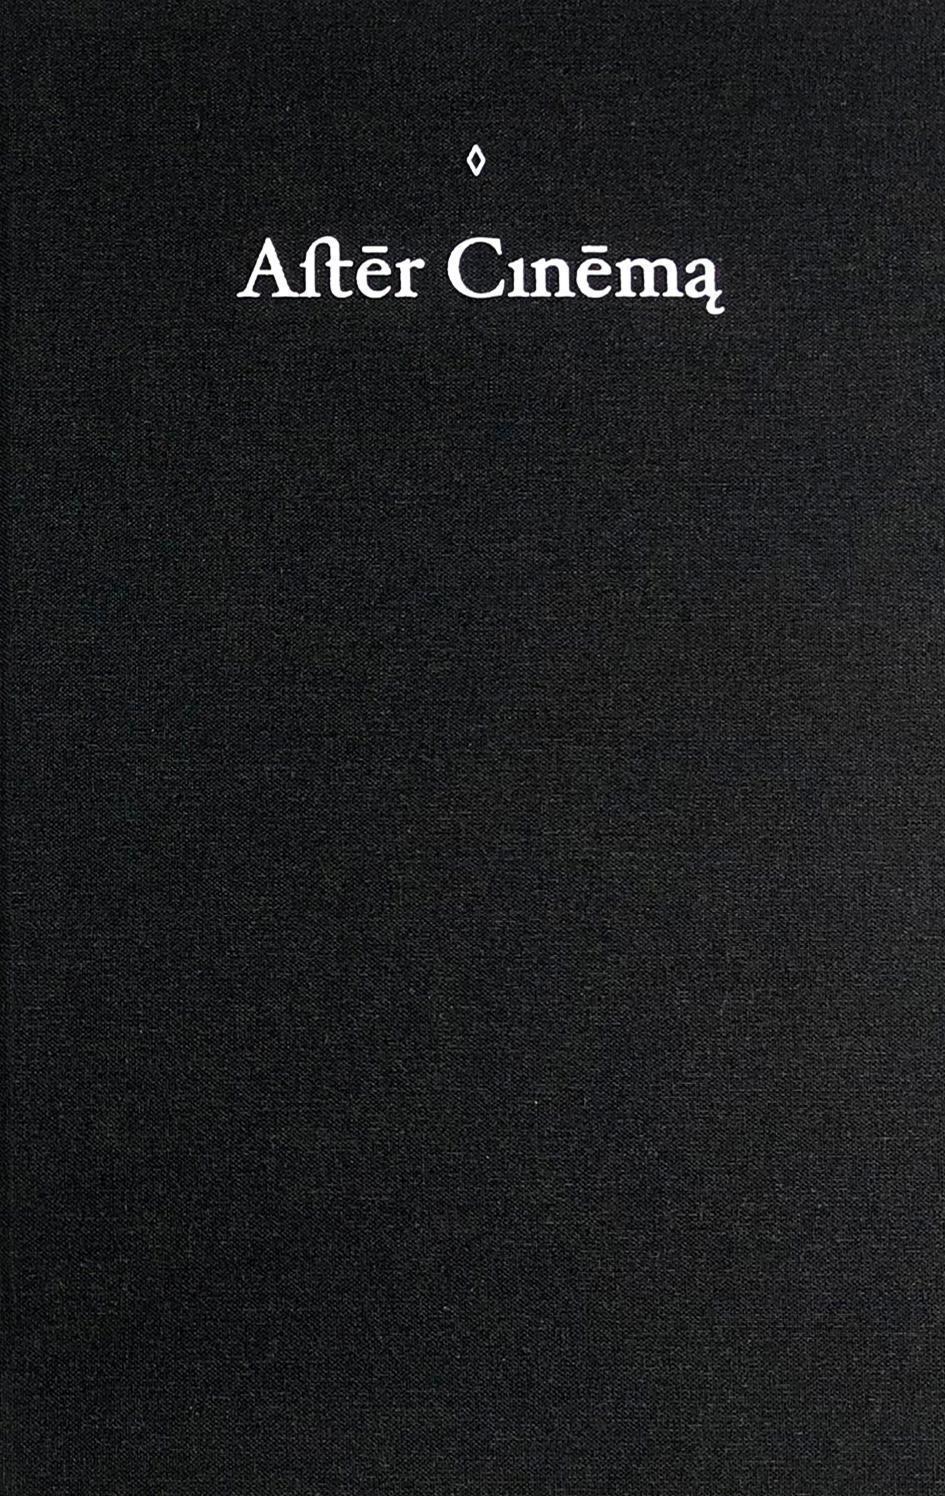 Azin Feizabadi. After Cinema